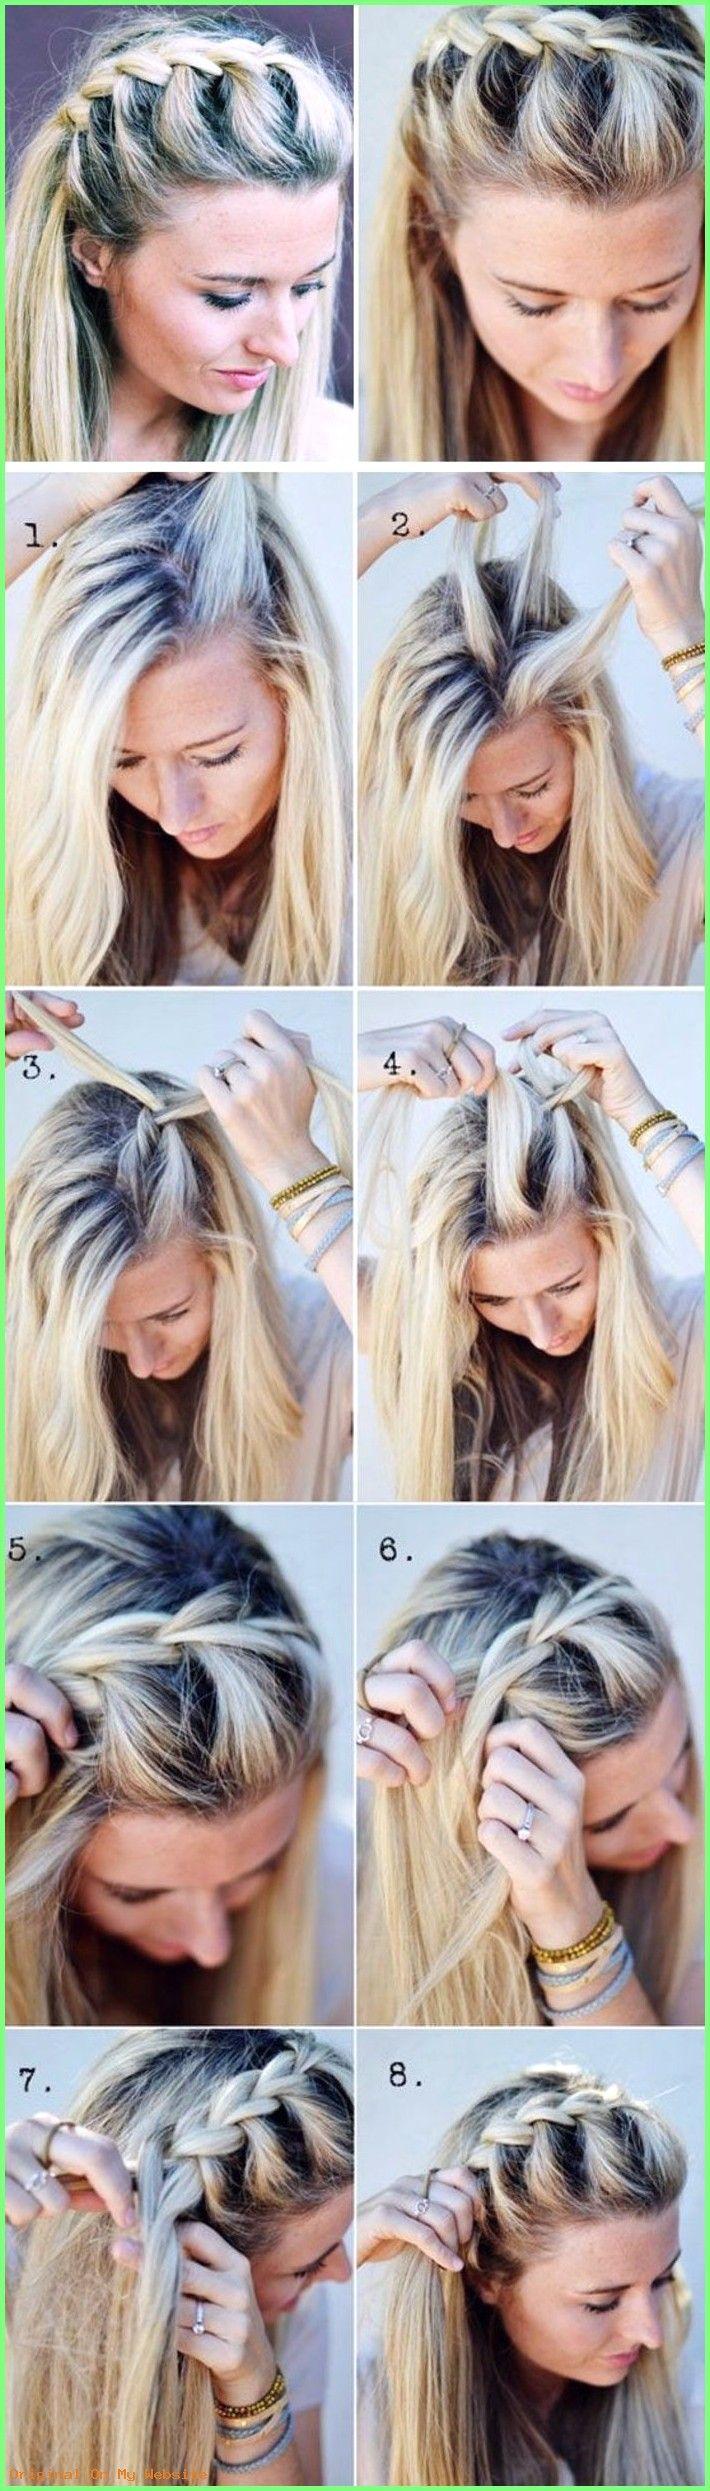 Geflochtene Frisuren Haare Flechten Mittellange Blonde Haare